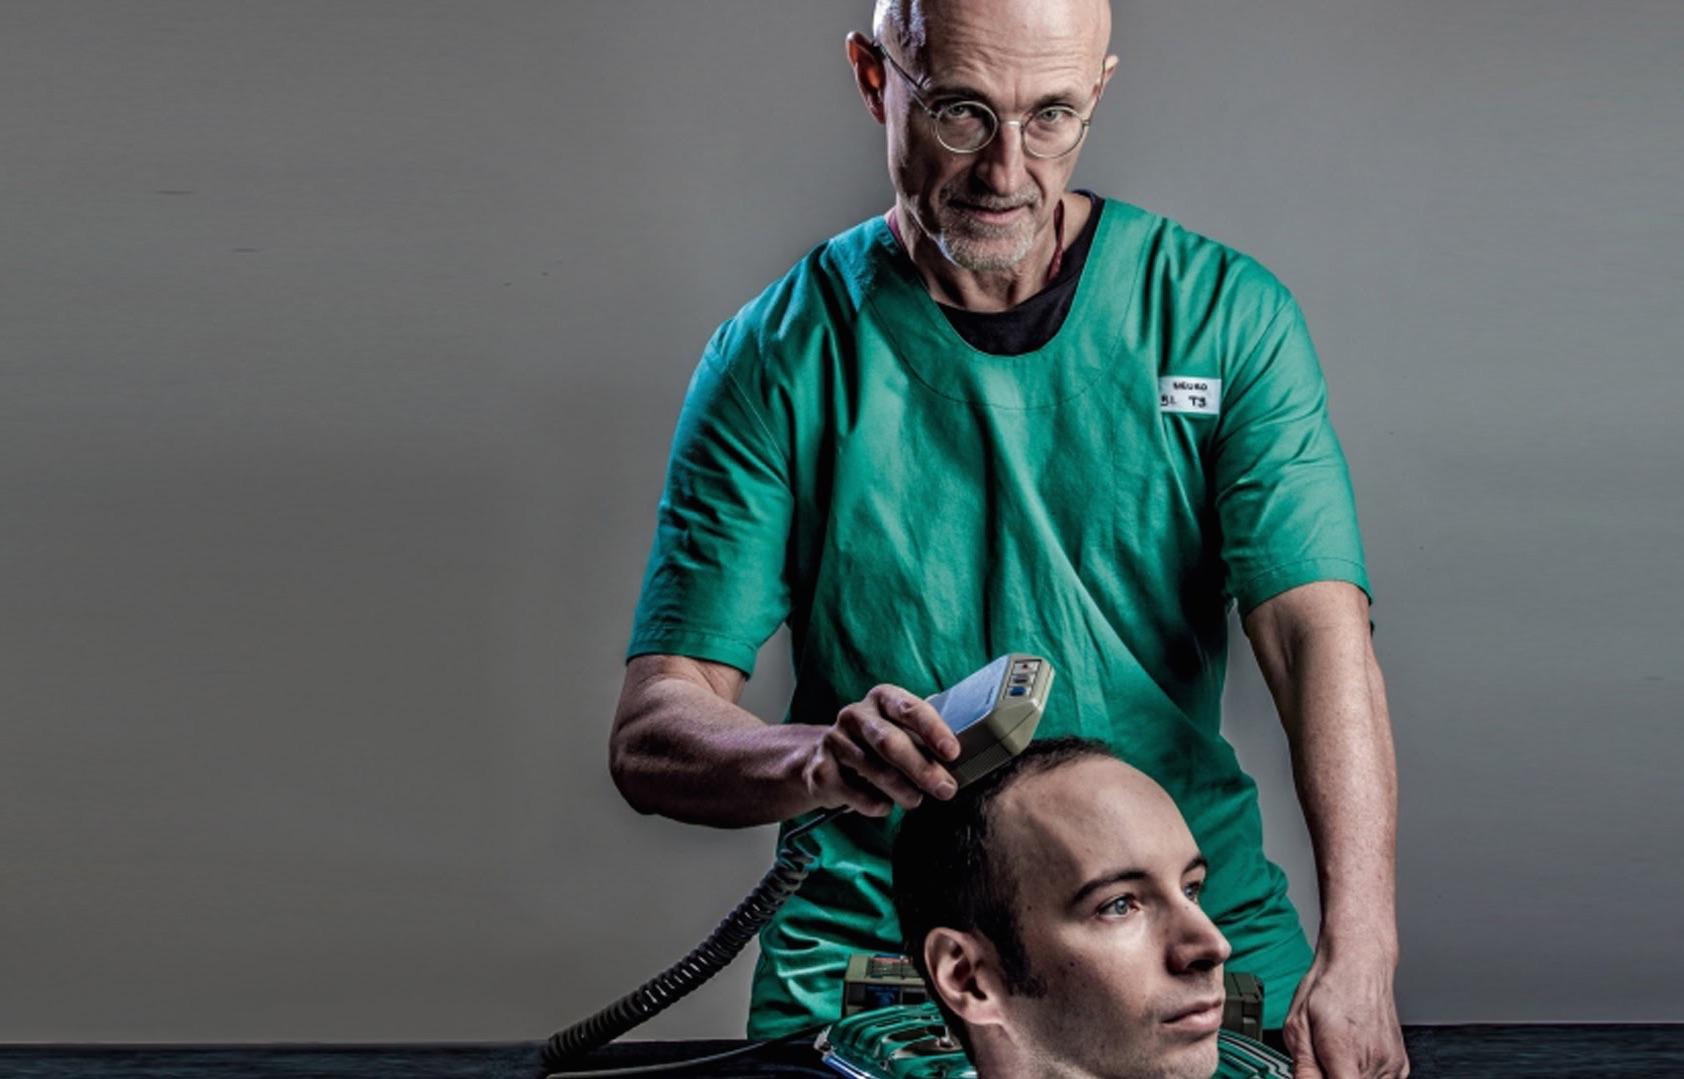 Tim hirurga uspešno izveo presađivanje ljudske glave na trup